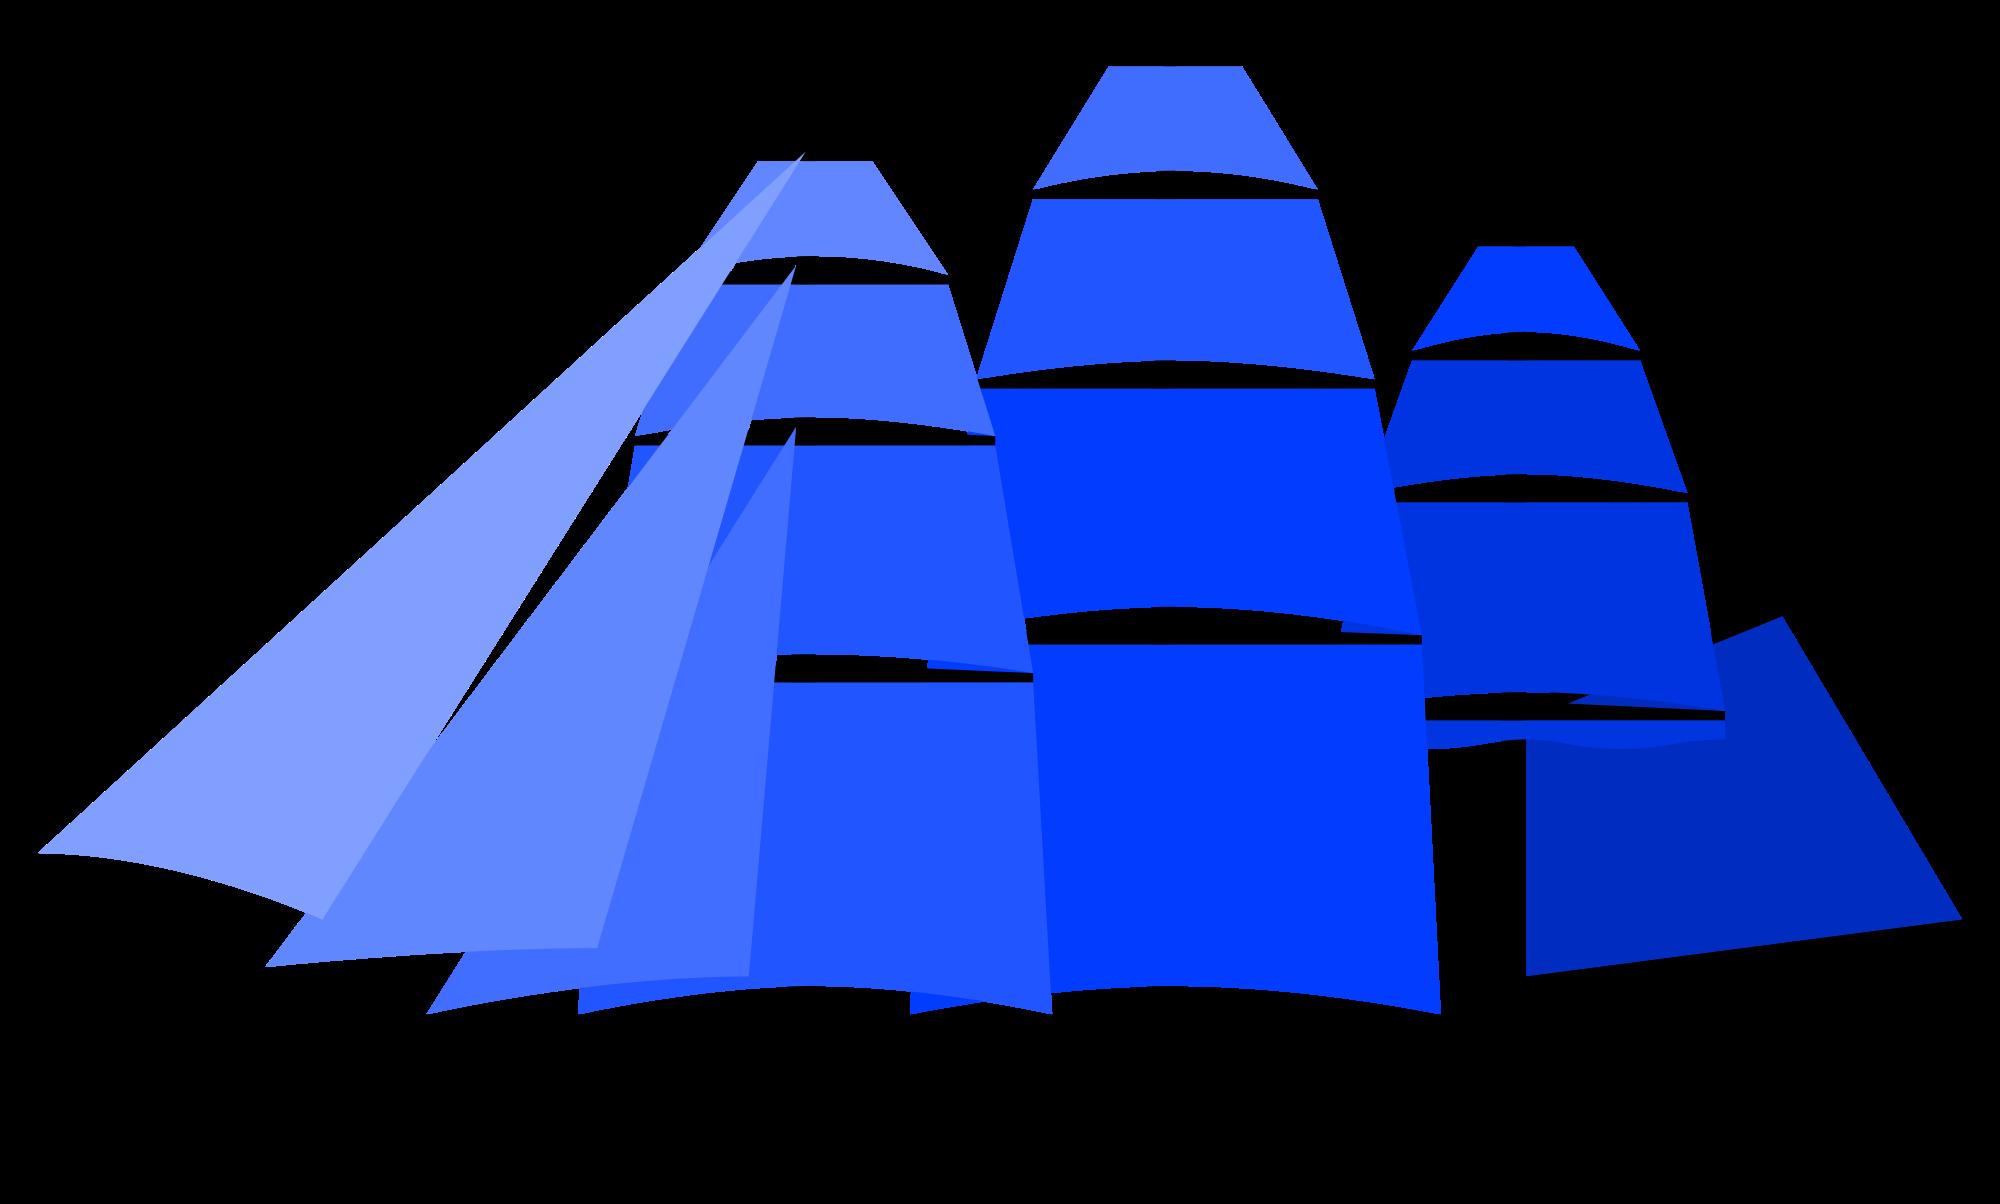 Sailing Ship clipart history subject Ship plan Wikimedia Open Commons